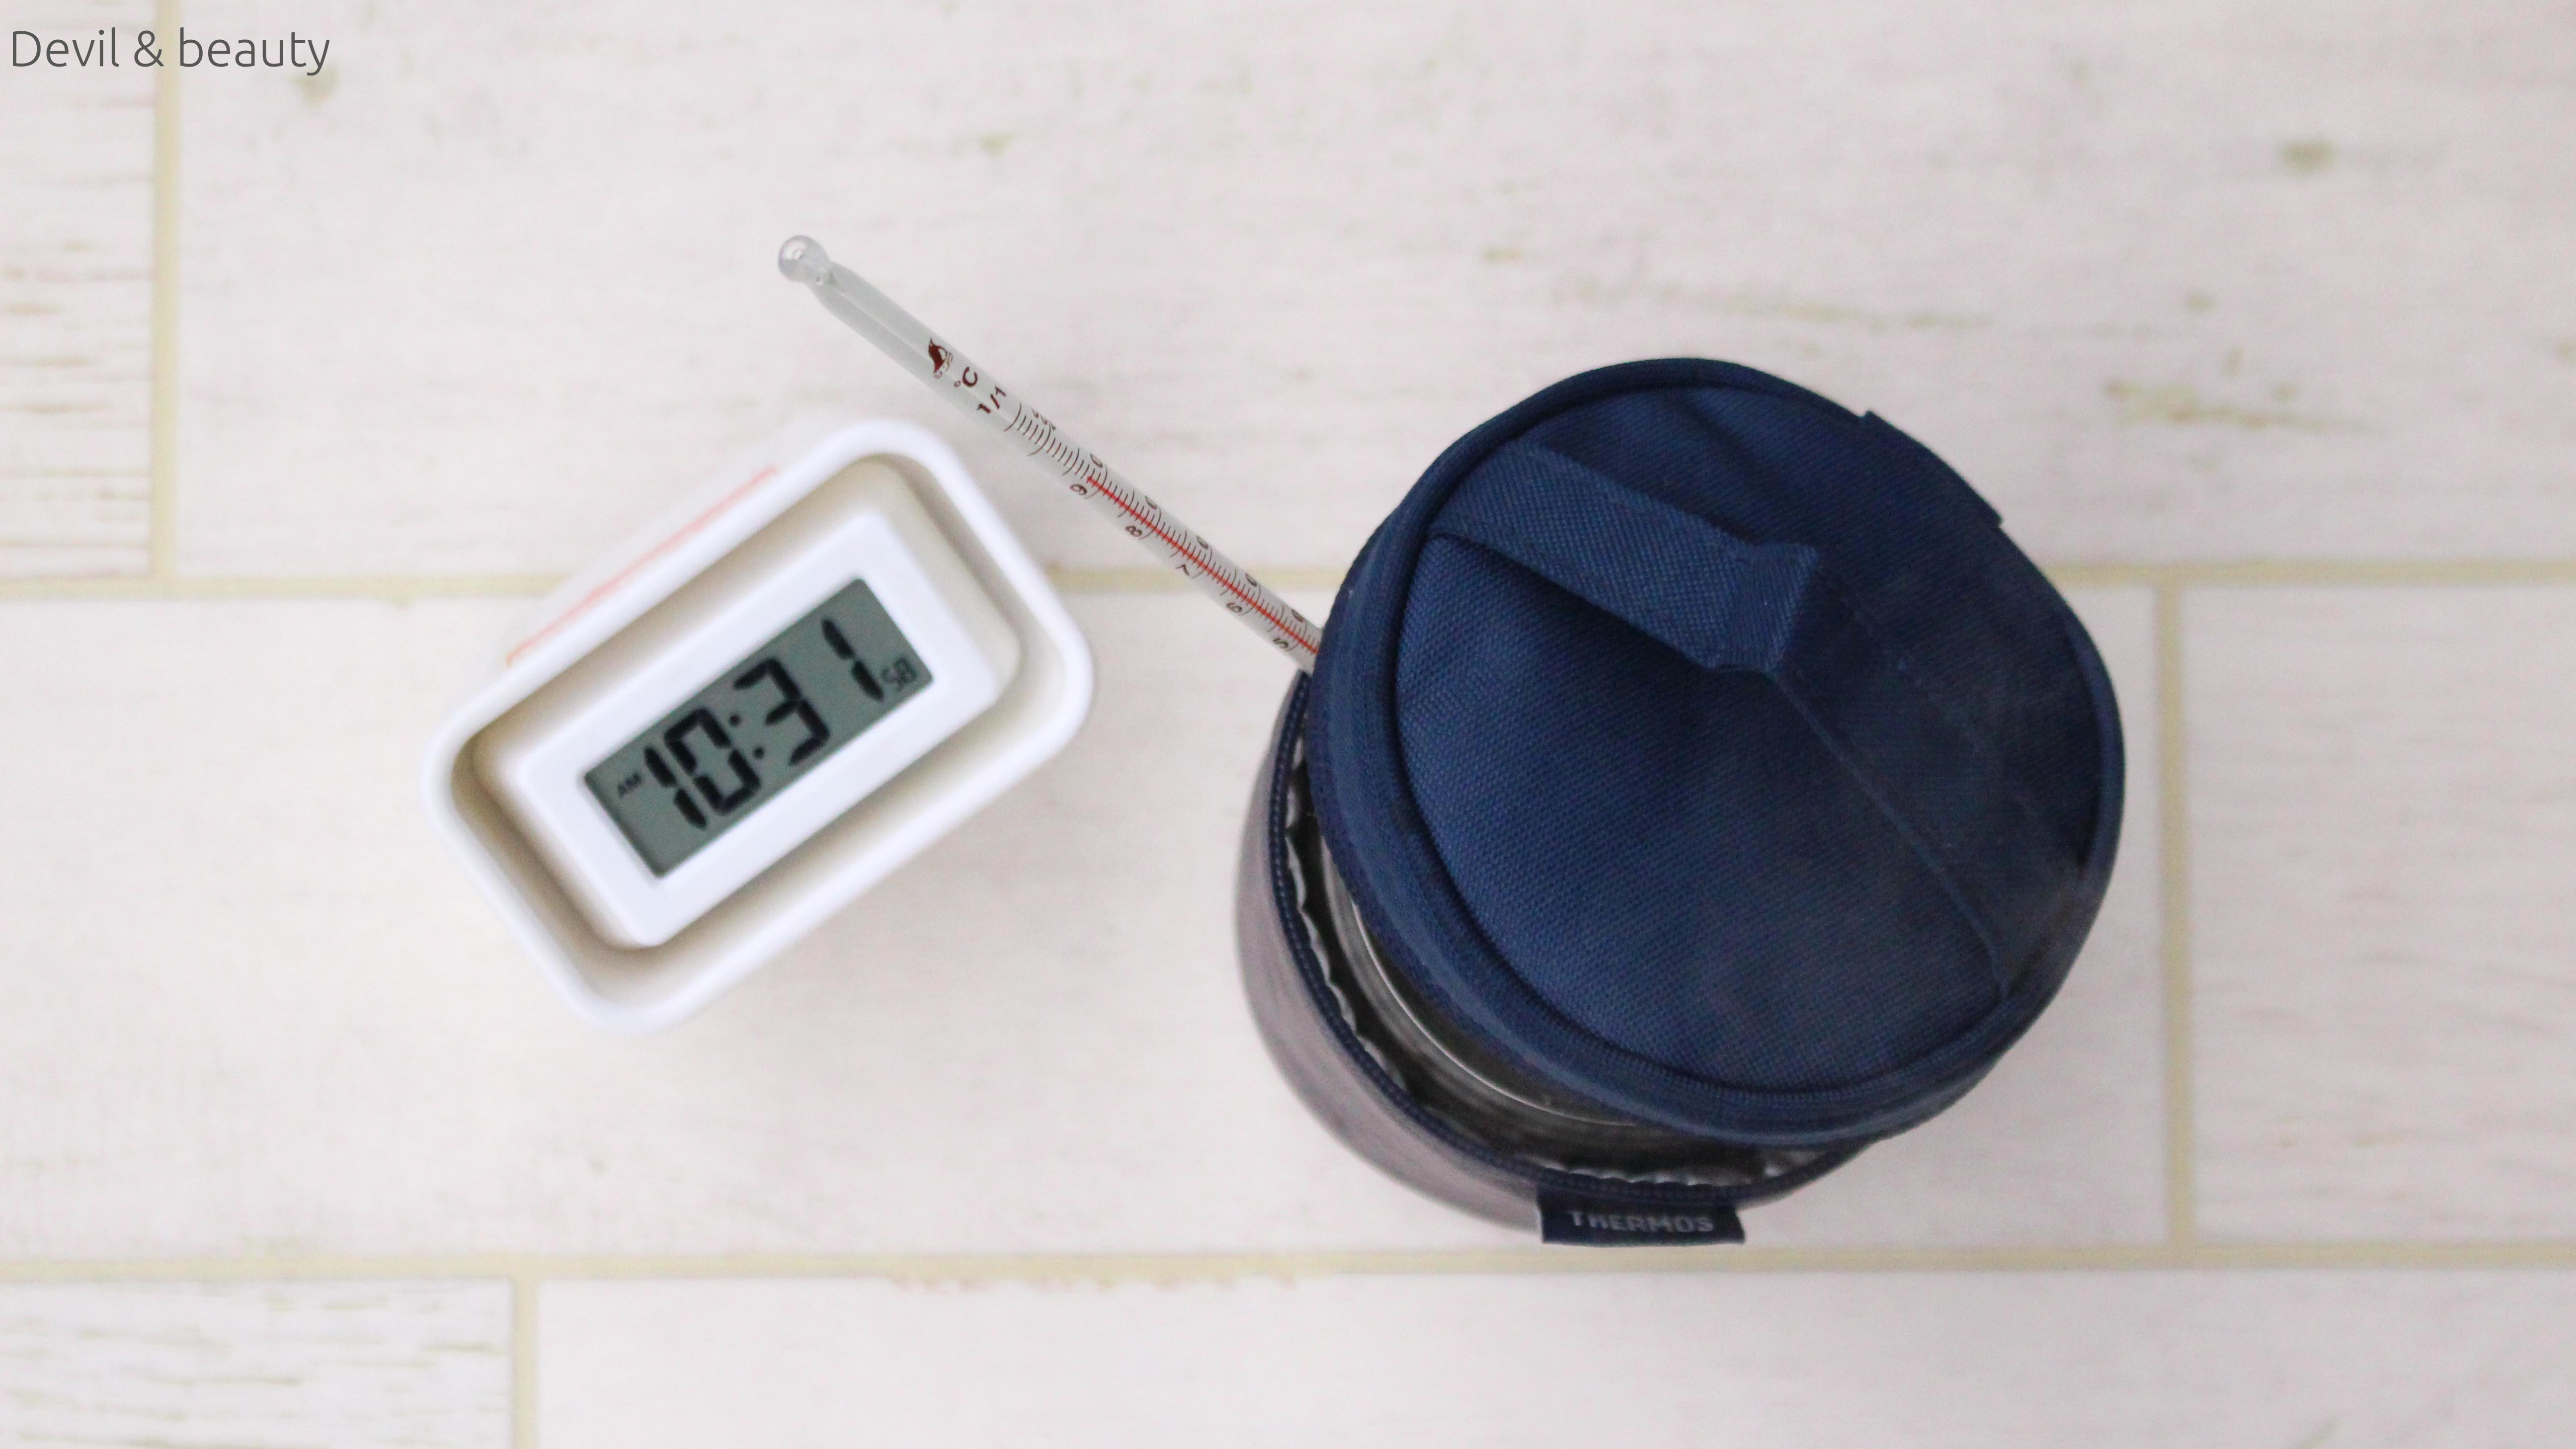 thermos-jbm501-6h-2